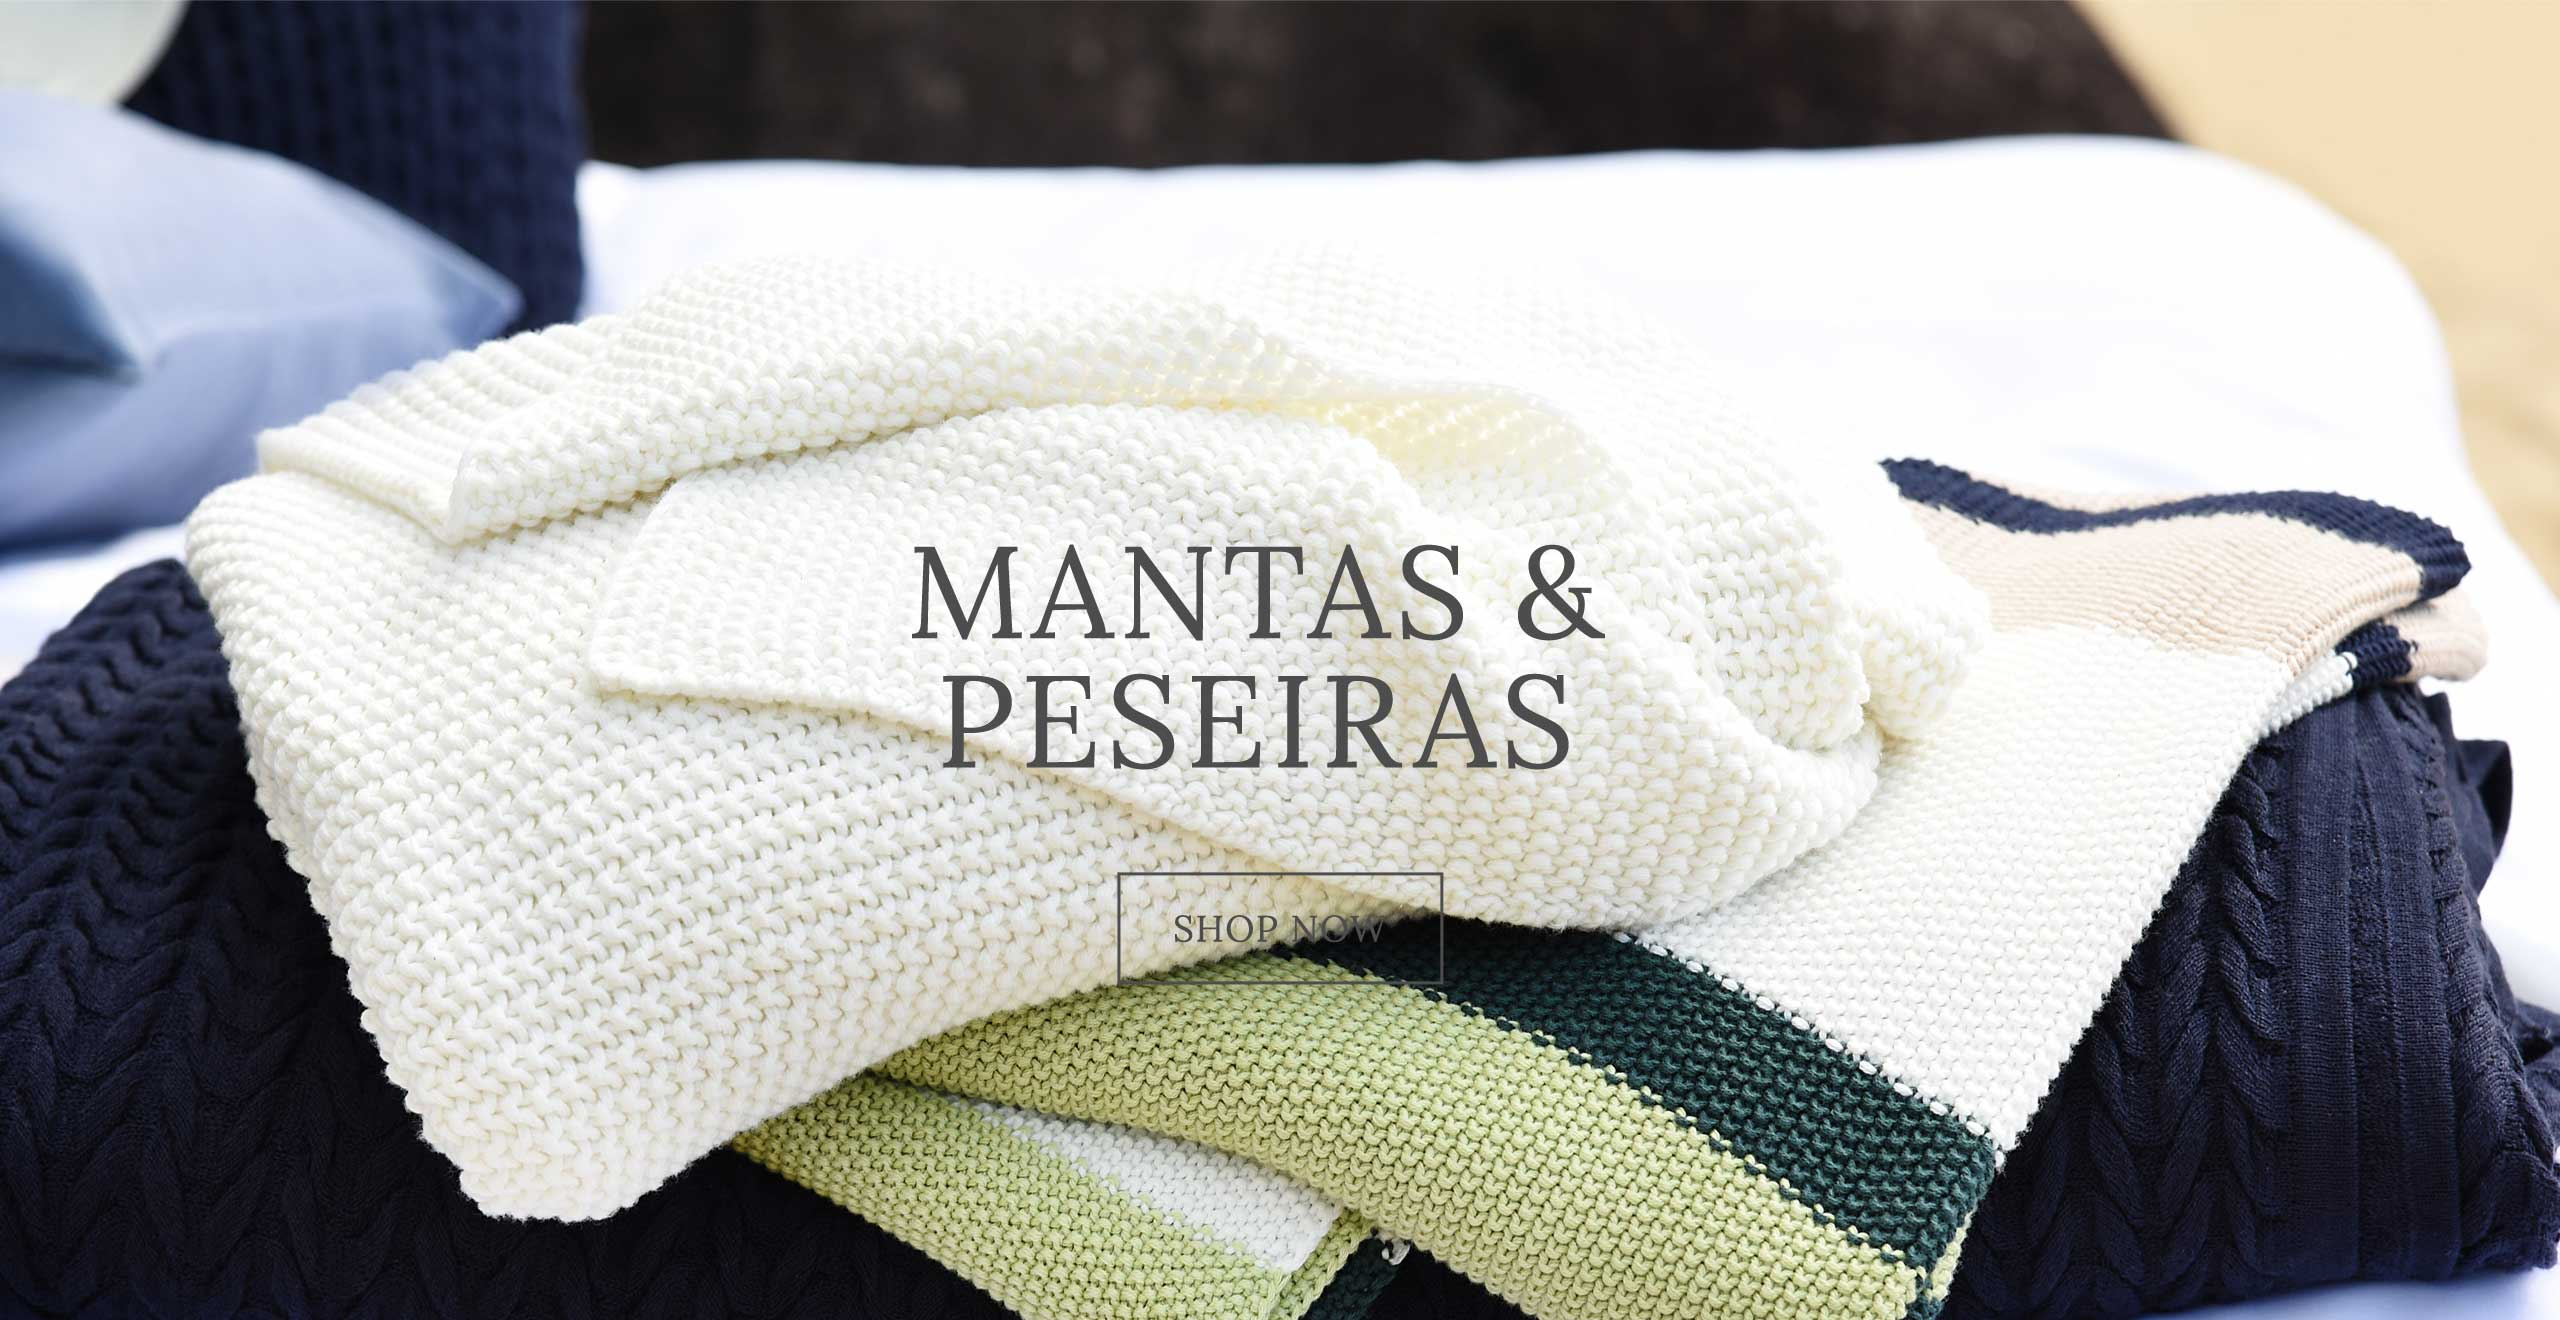 Mantas_12_12_17